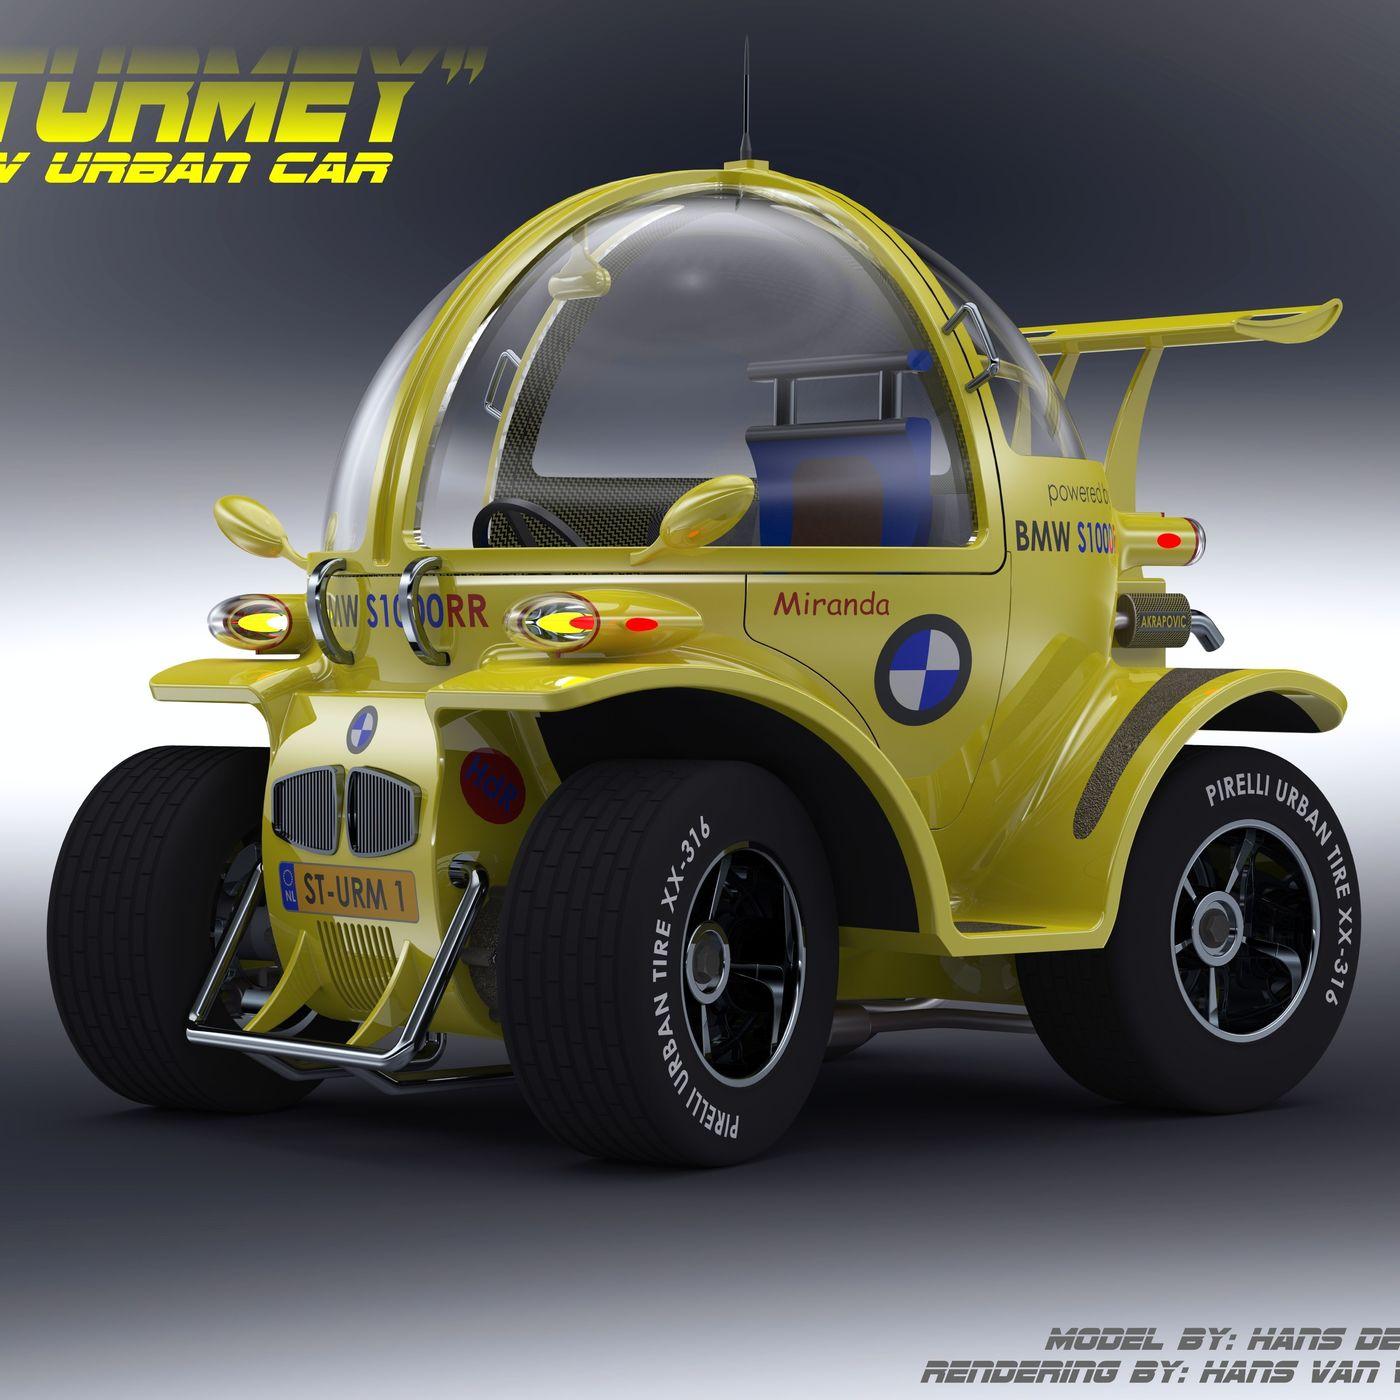 """STURMEY"" Urban Car"